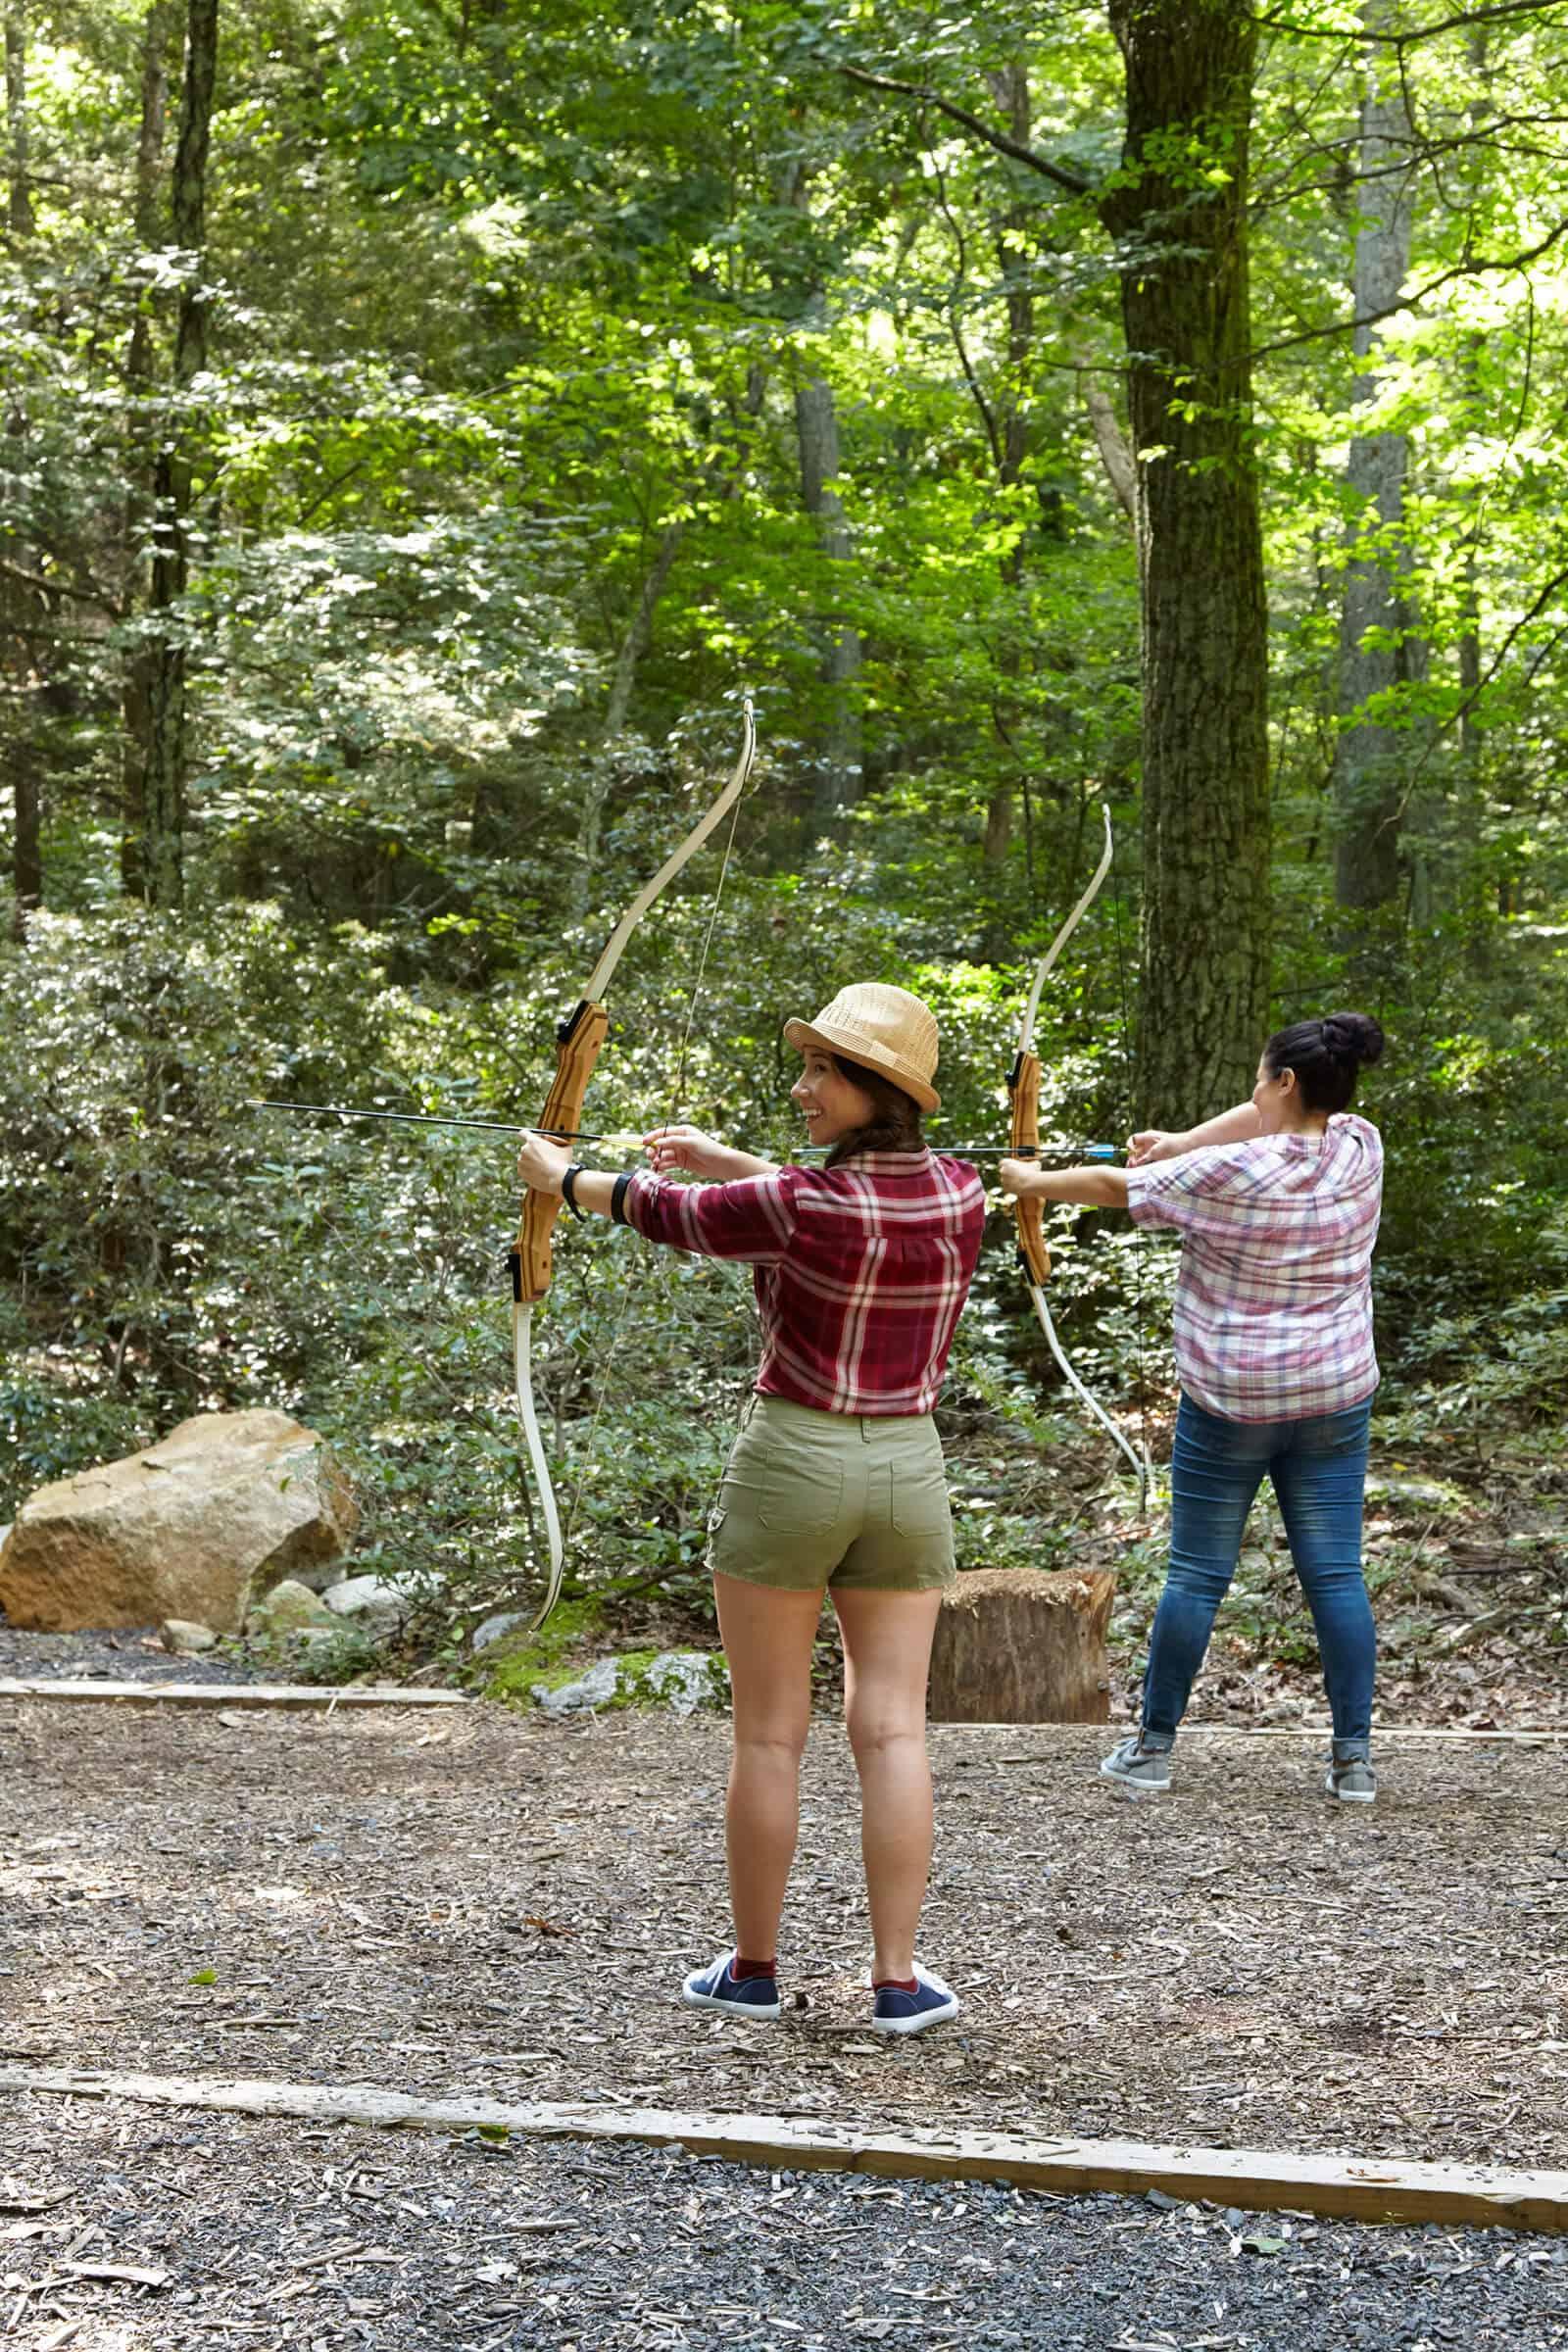 Archery - Mother's Day Getaway - Mohonk